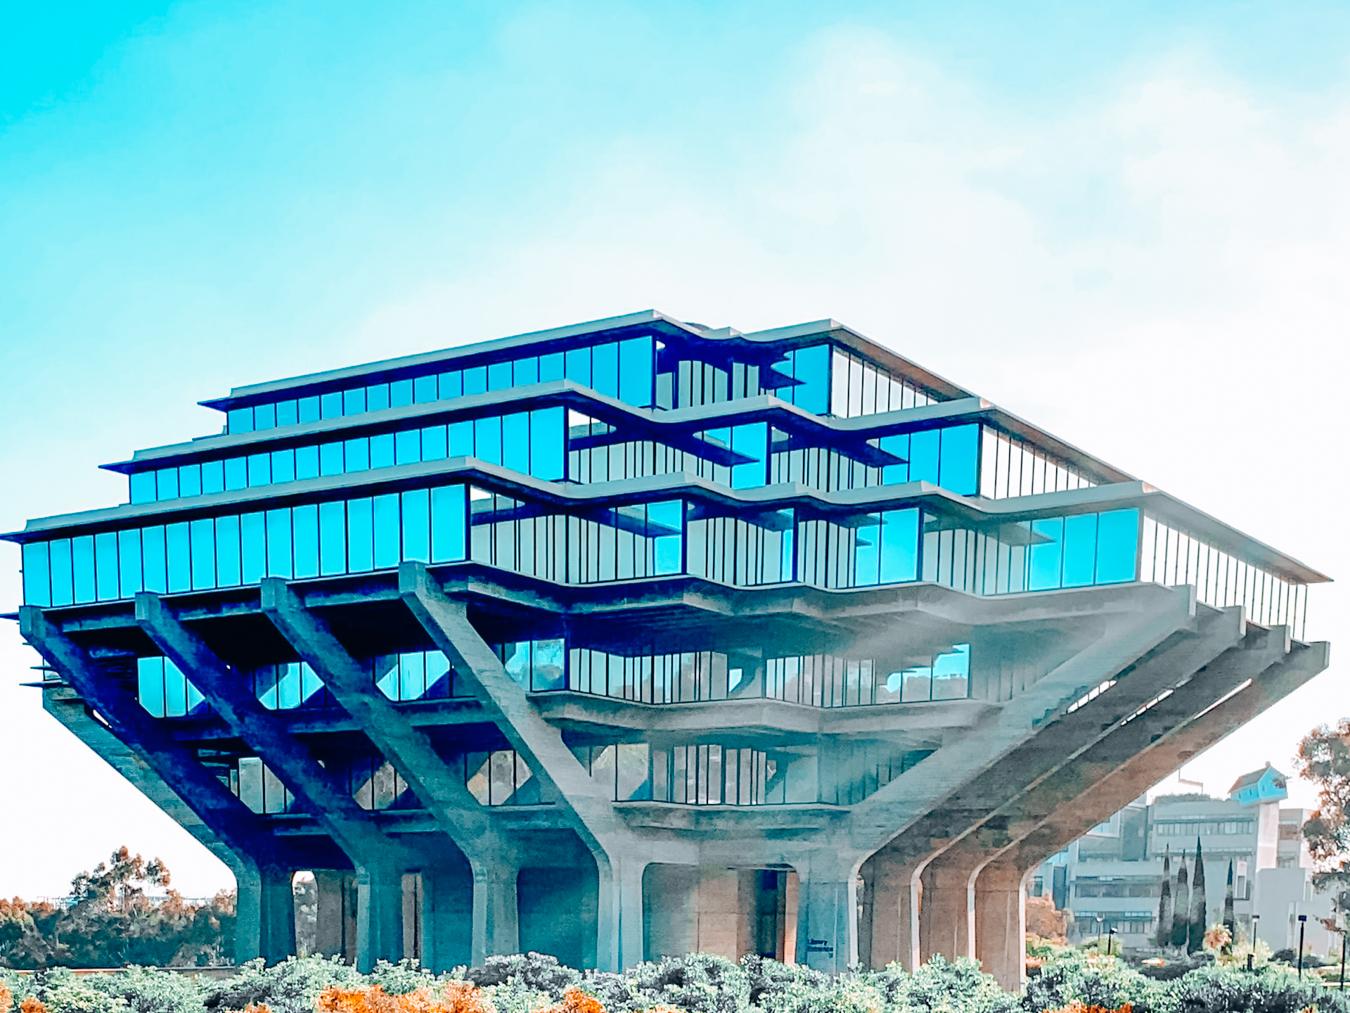 Building of UC San Diego